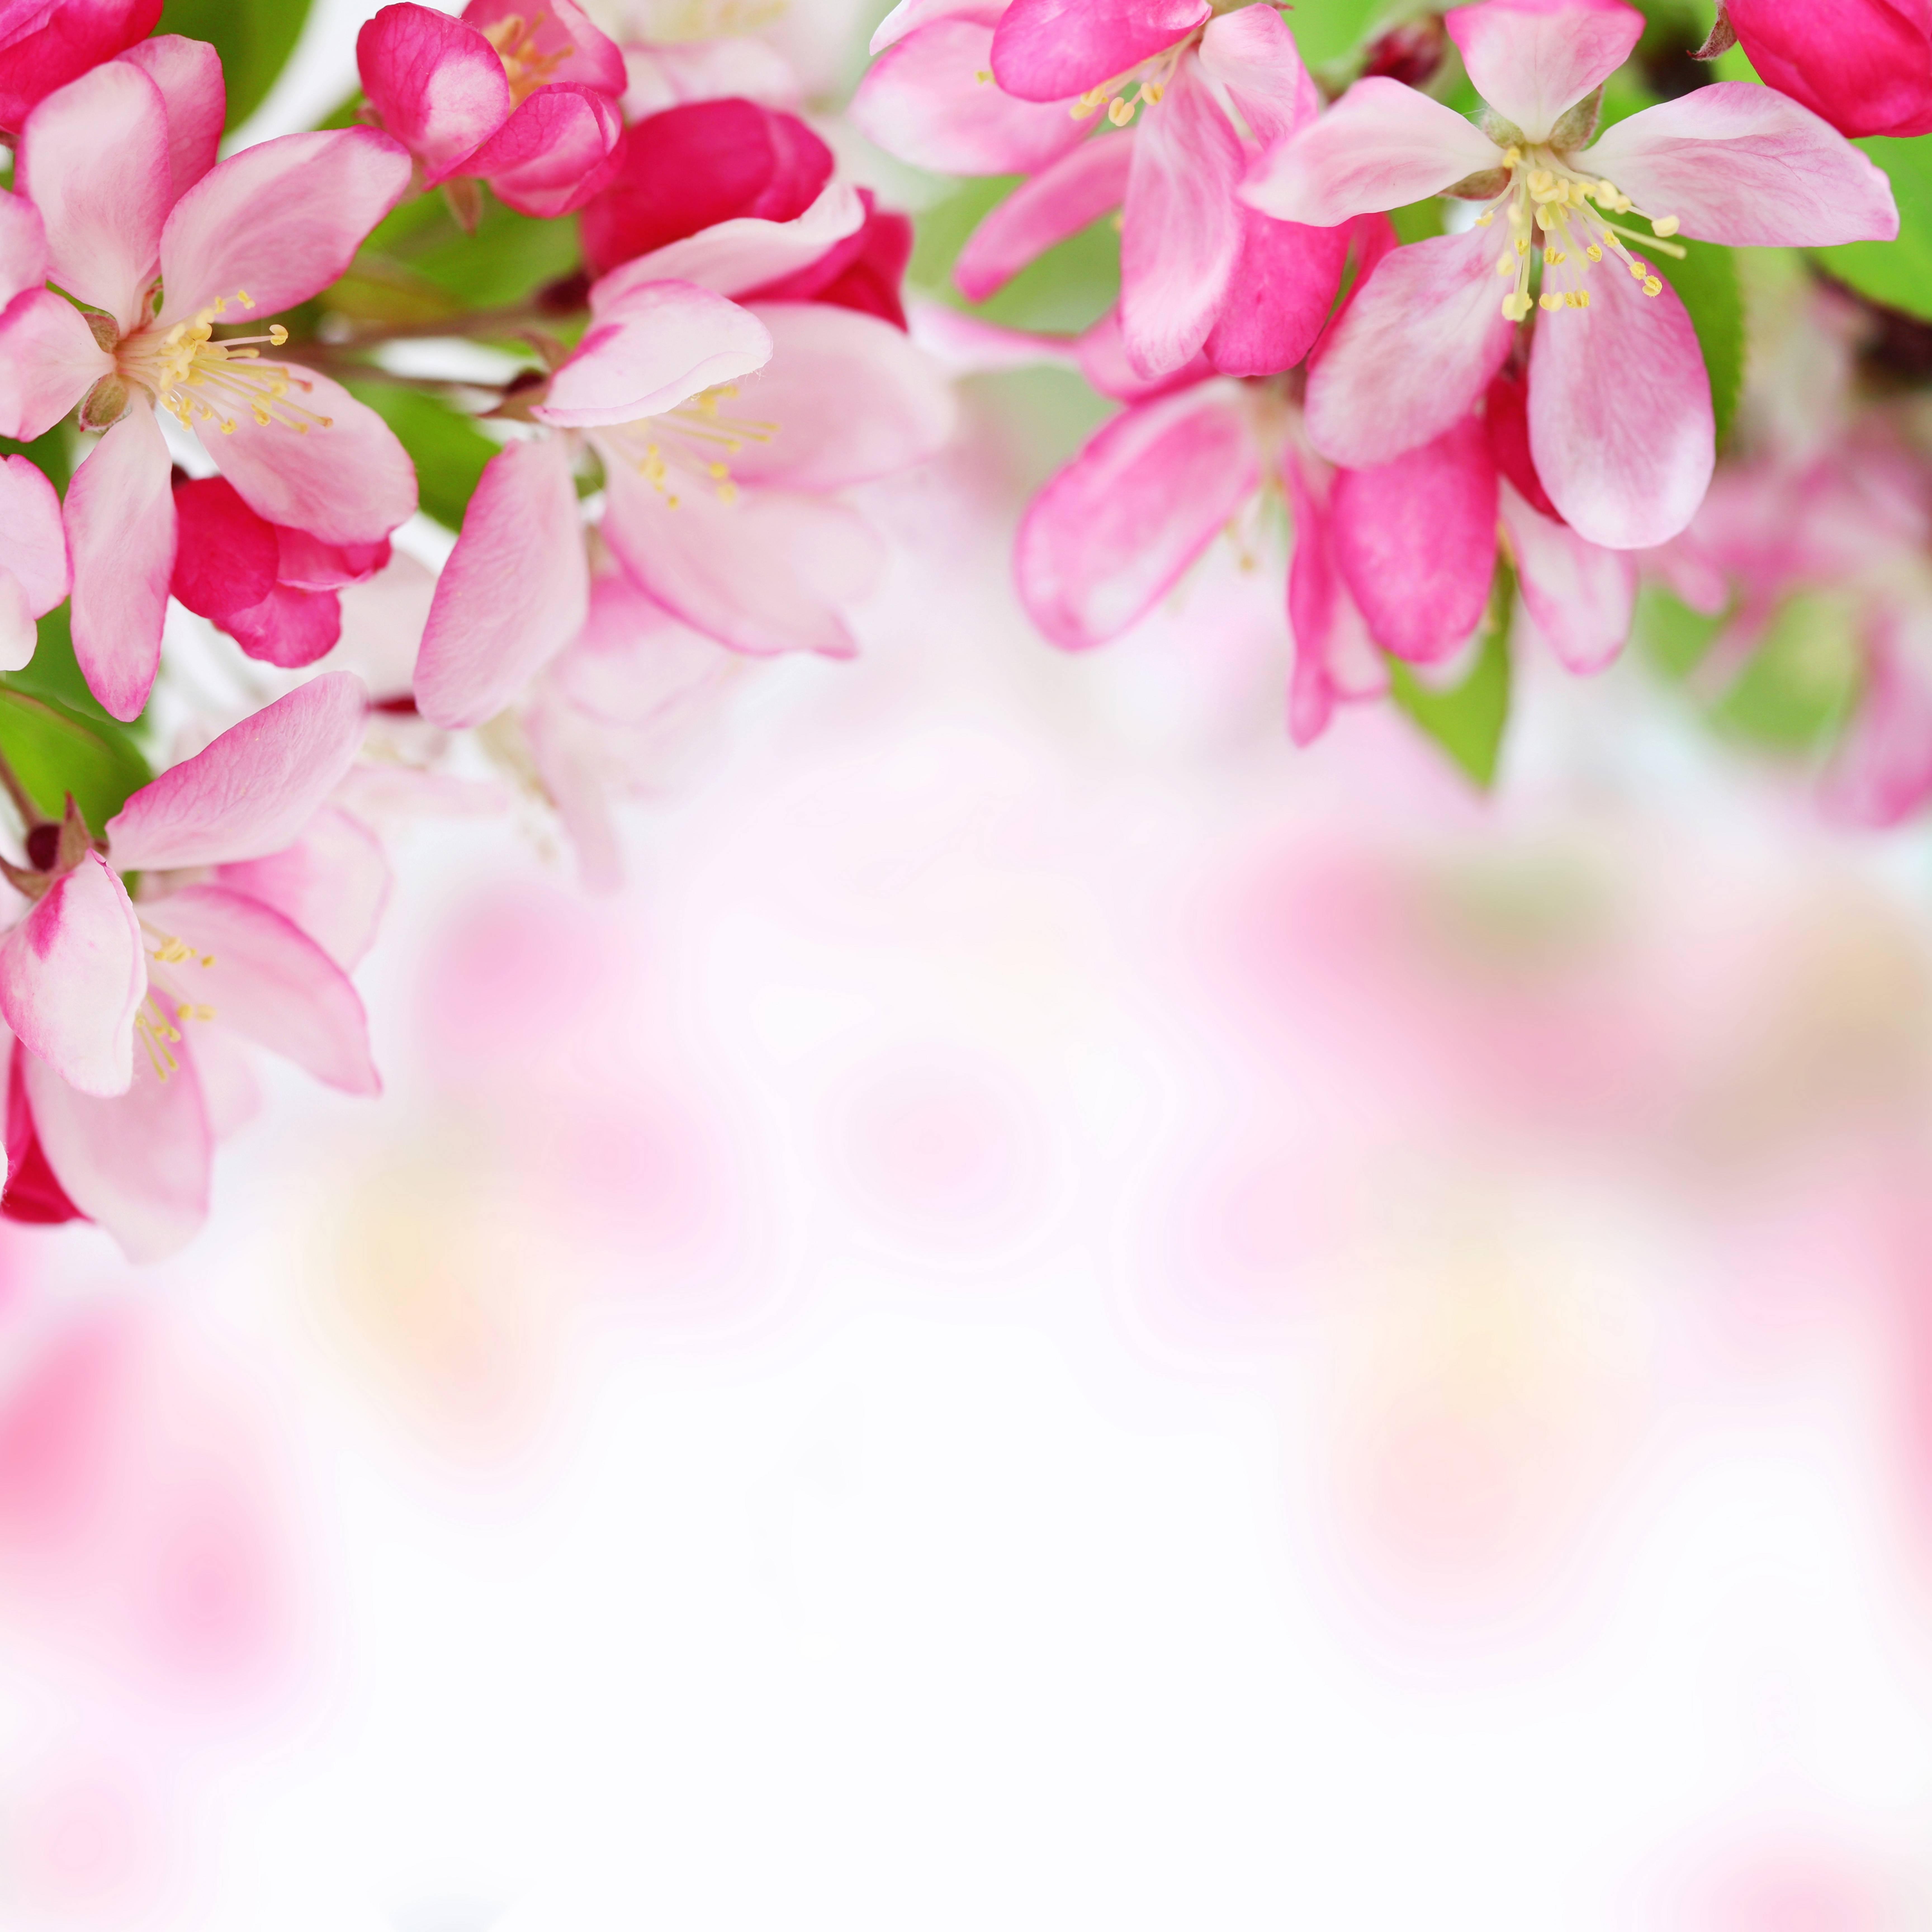 spring backgrounds image wallpaper cave